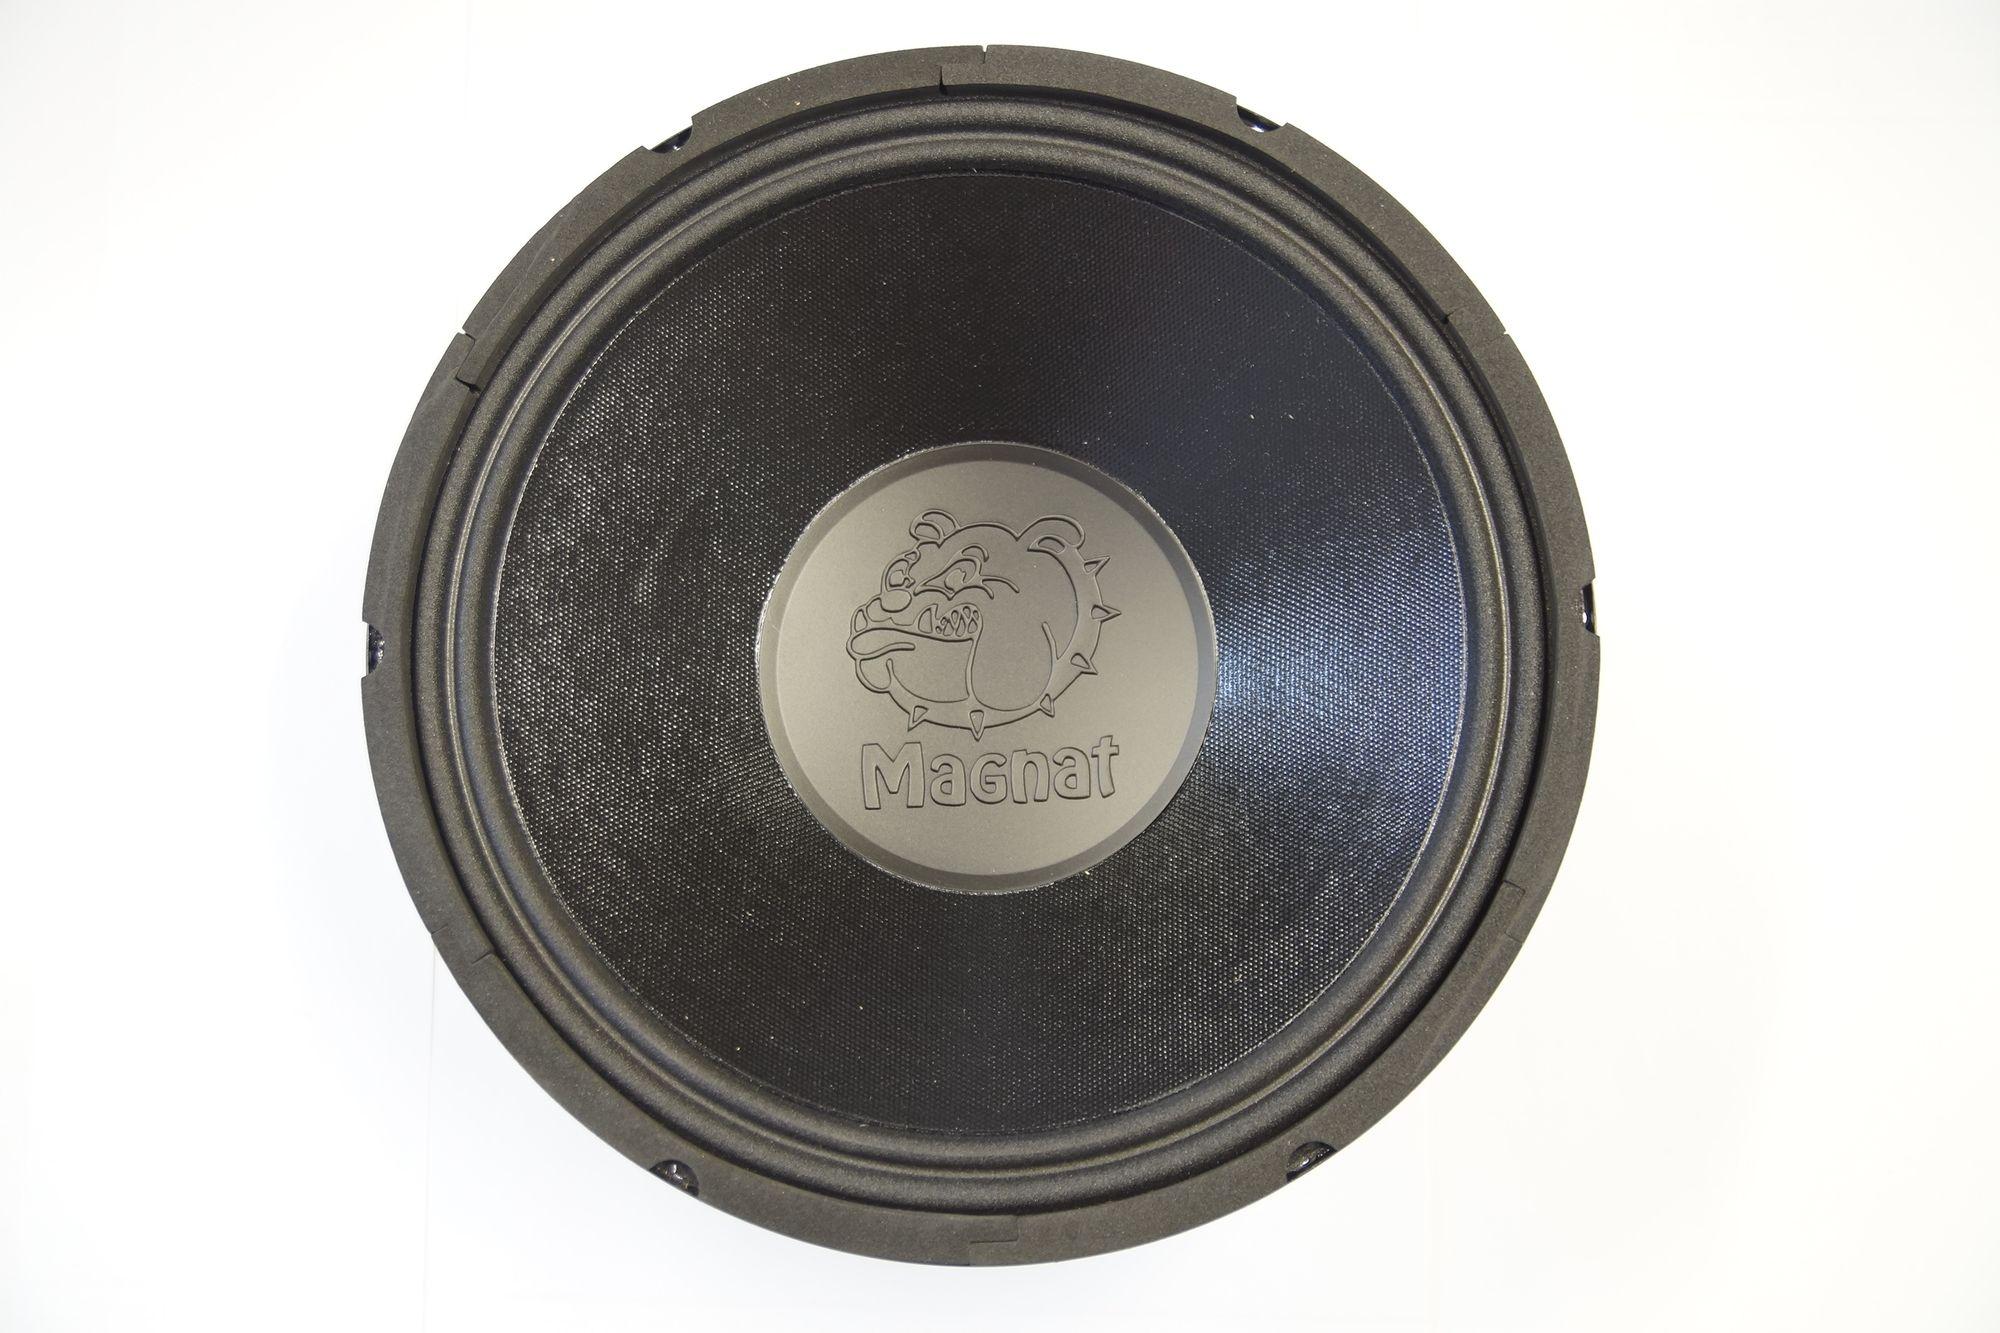 1 Stück 30 cm Subwoofer Magnat MWS 300CP4110 ISO Basslautsprecher Tieftöner